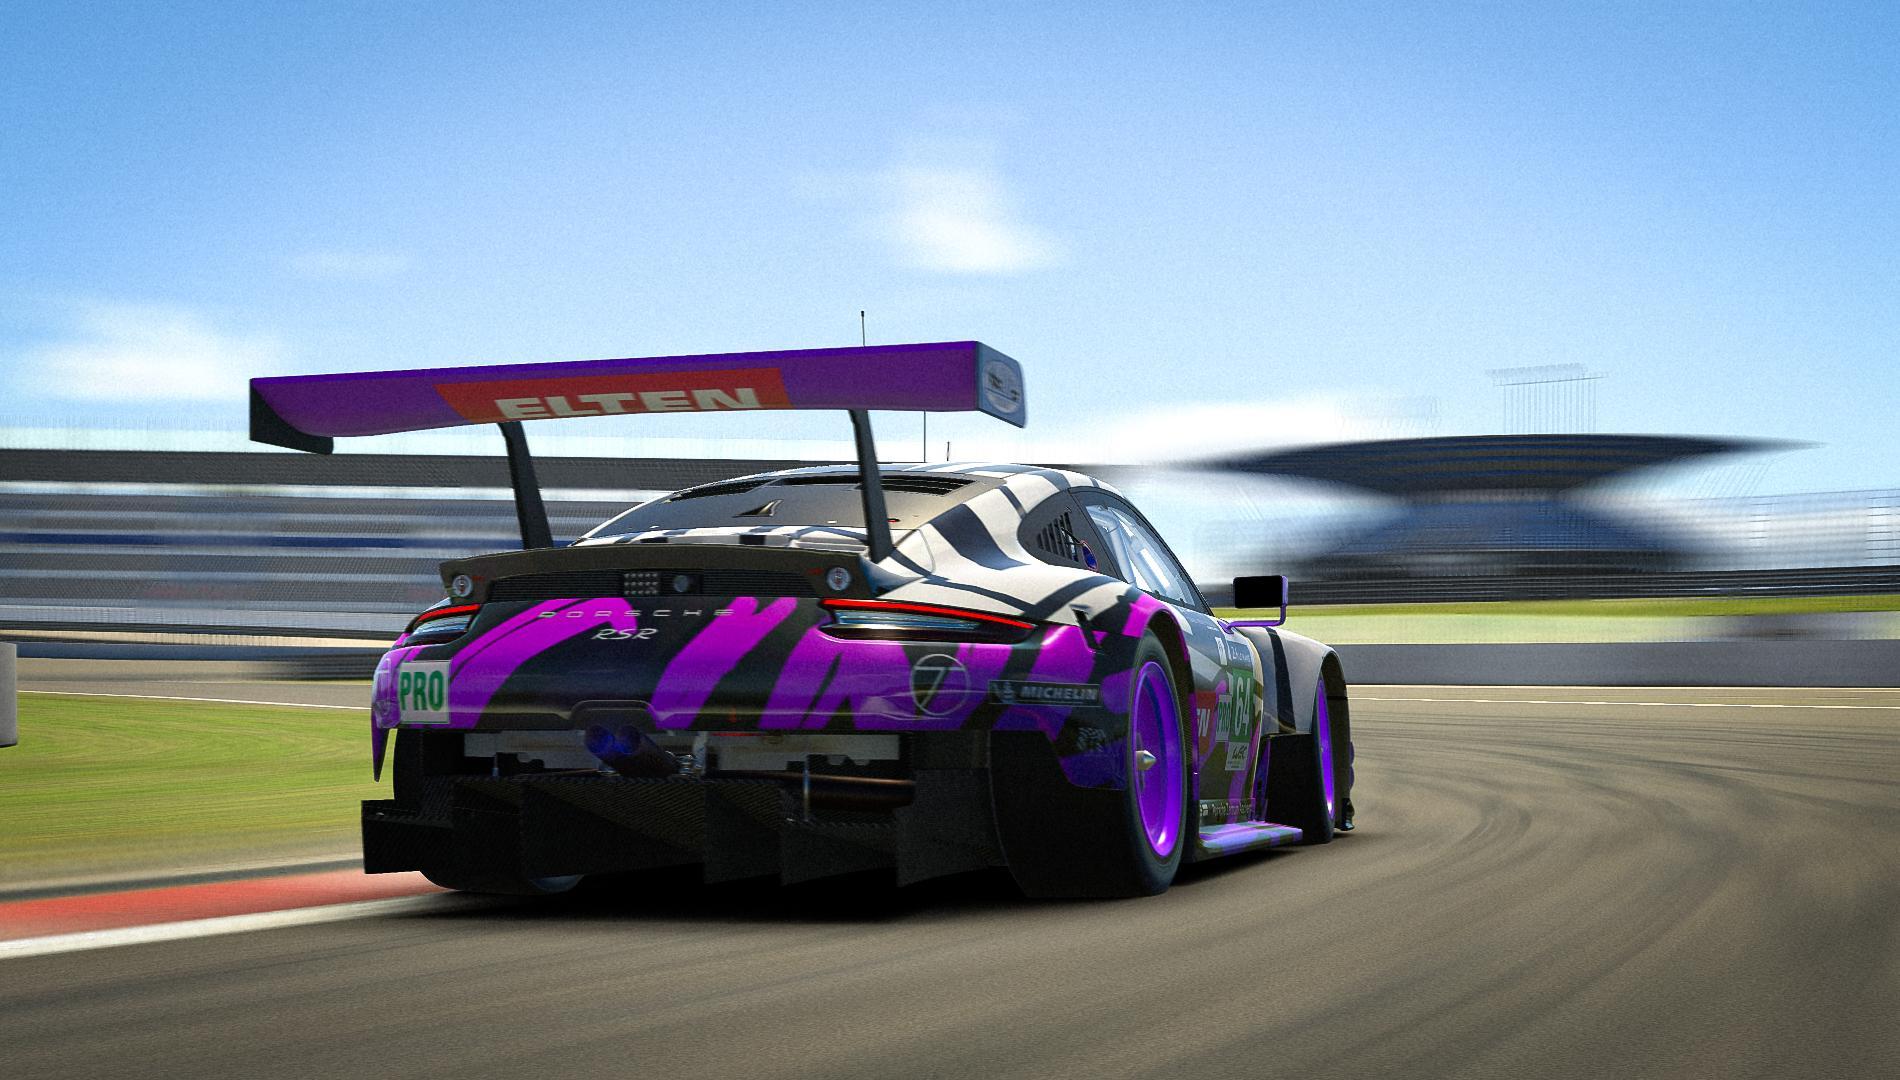 Preview of IRONFORCE Porsche 911 RSR 2019 by Dominik Gerardts